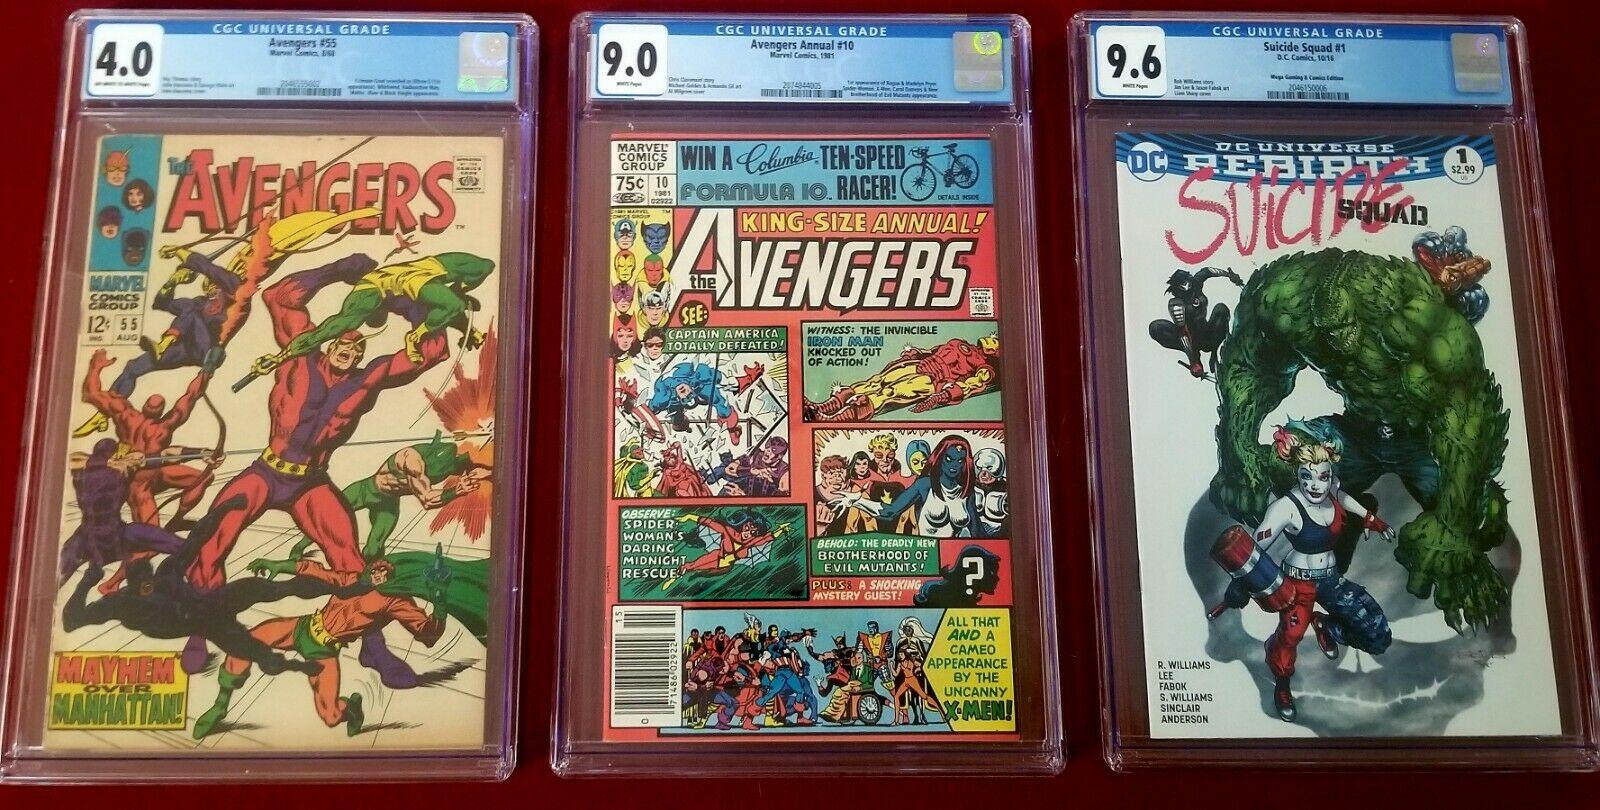 Avengers Annual#10 CGC-9.0 FIRST ROGUE + AVENGERS 55 CGC-1ST ULTRON+HARLEY QUINN